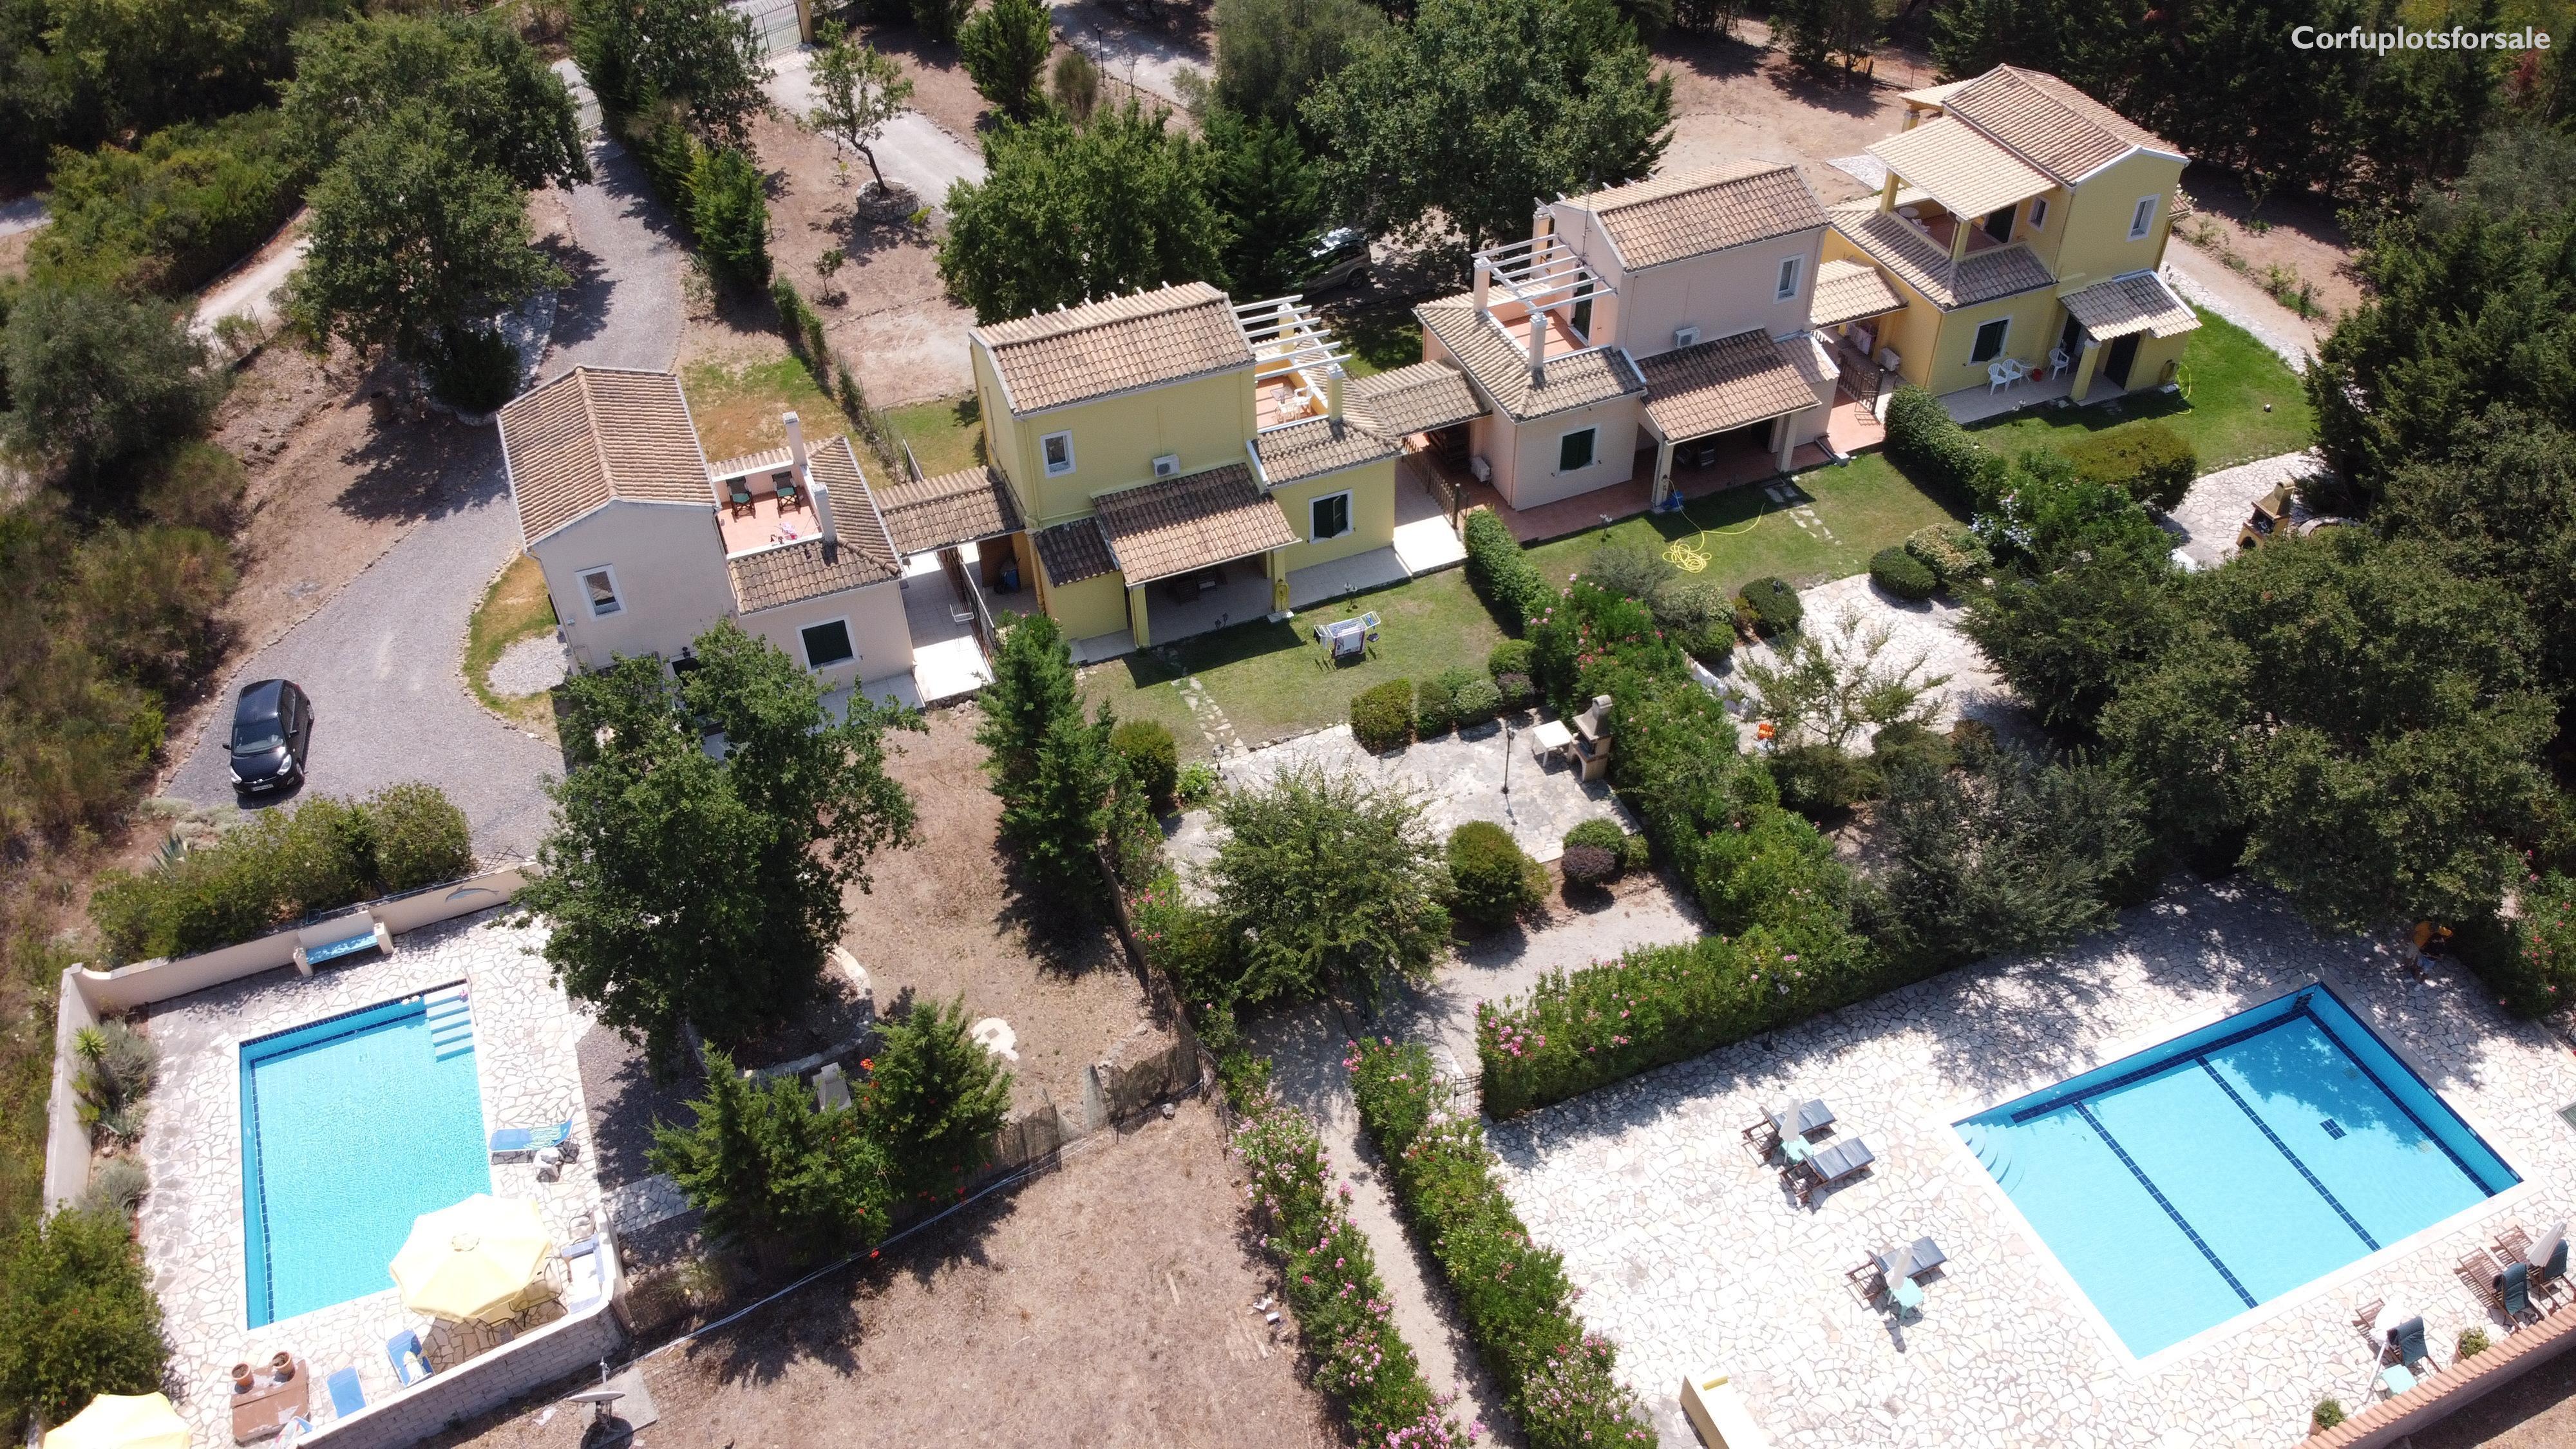 Four detached charming villas of 75 sq.m each